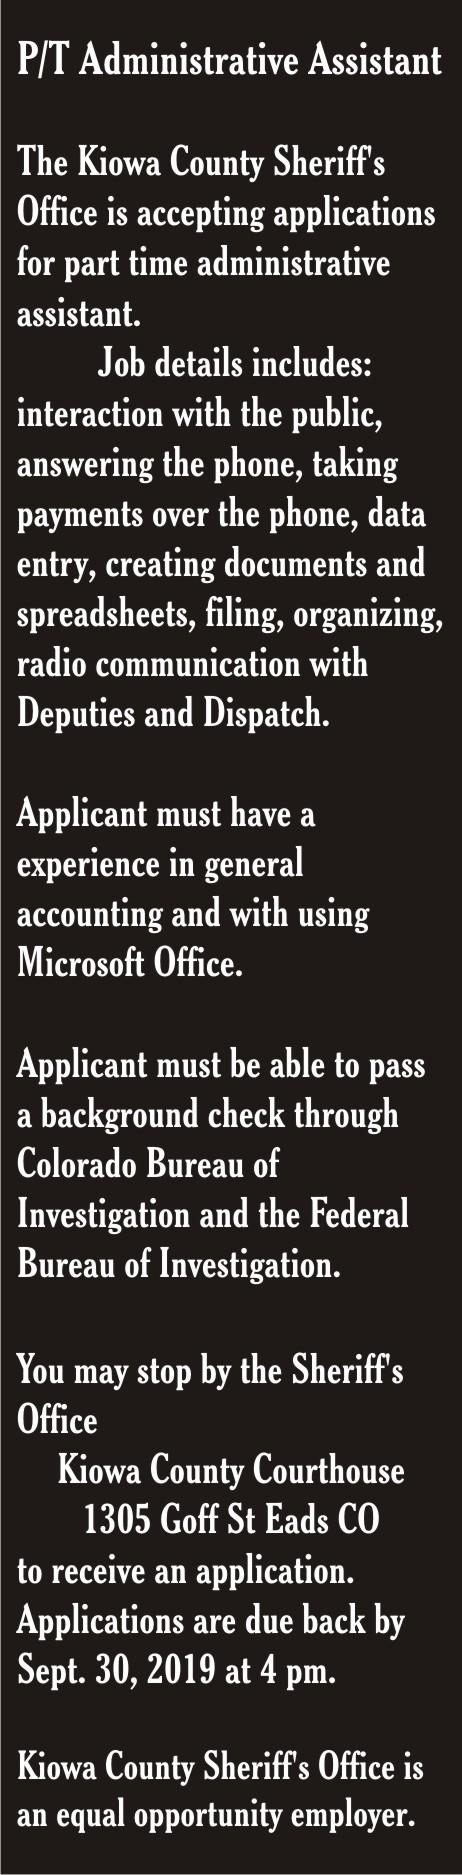 AD 2019-09 Help Wanted - Kiowa County Sheriff's Office